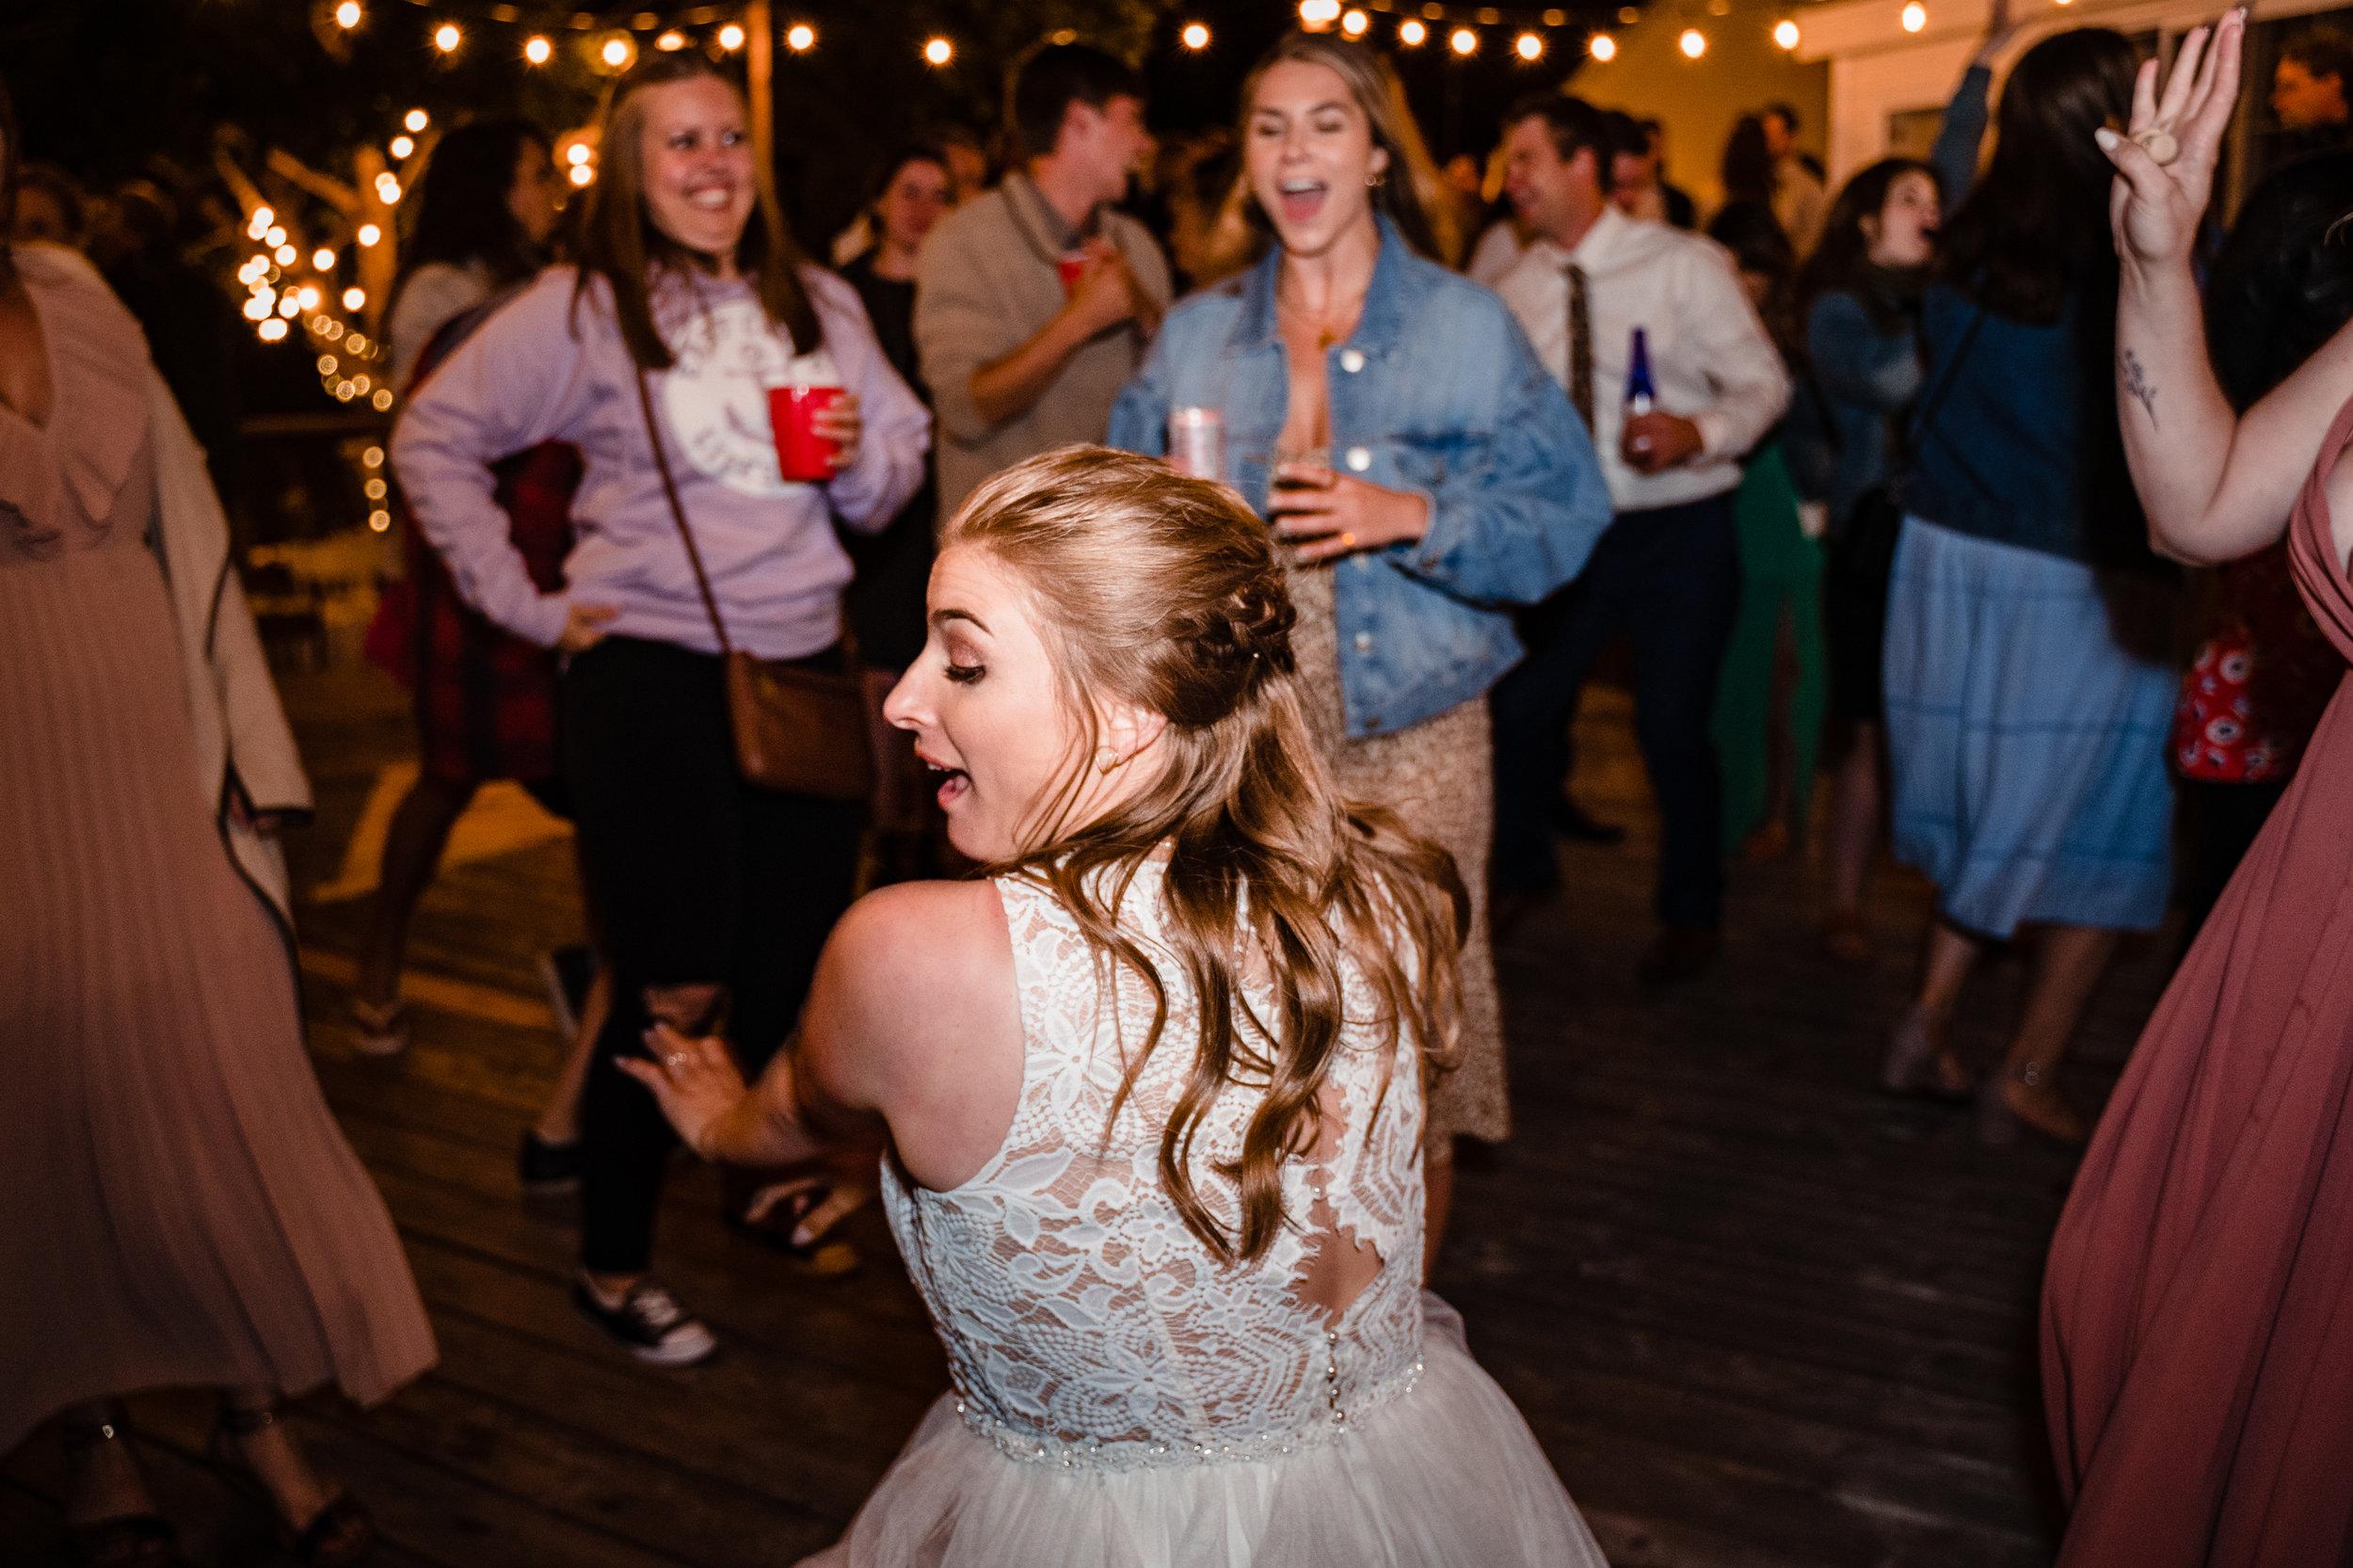 Janelle-Mitch-Halifax-Wedding-Nova-Scotia-Photography (154 of 163).jpg